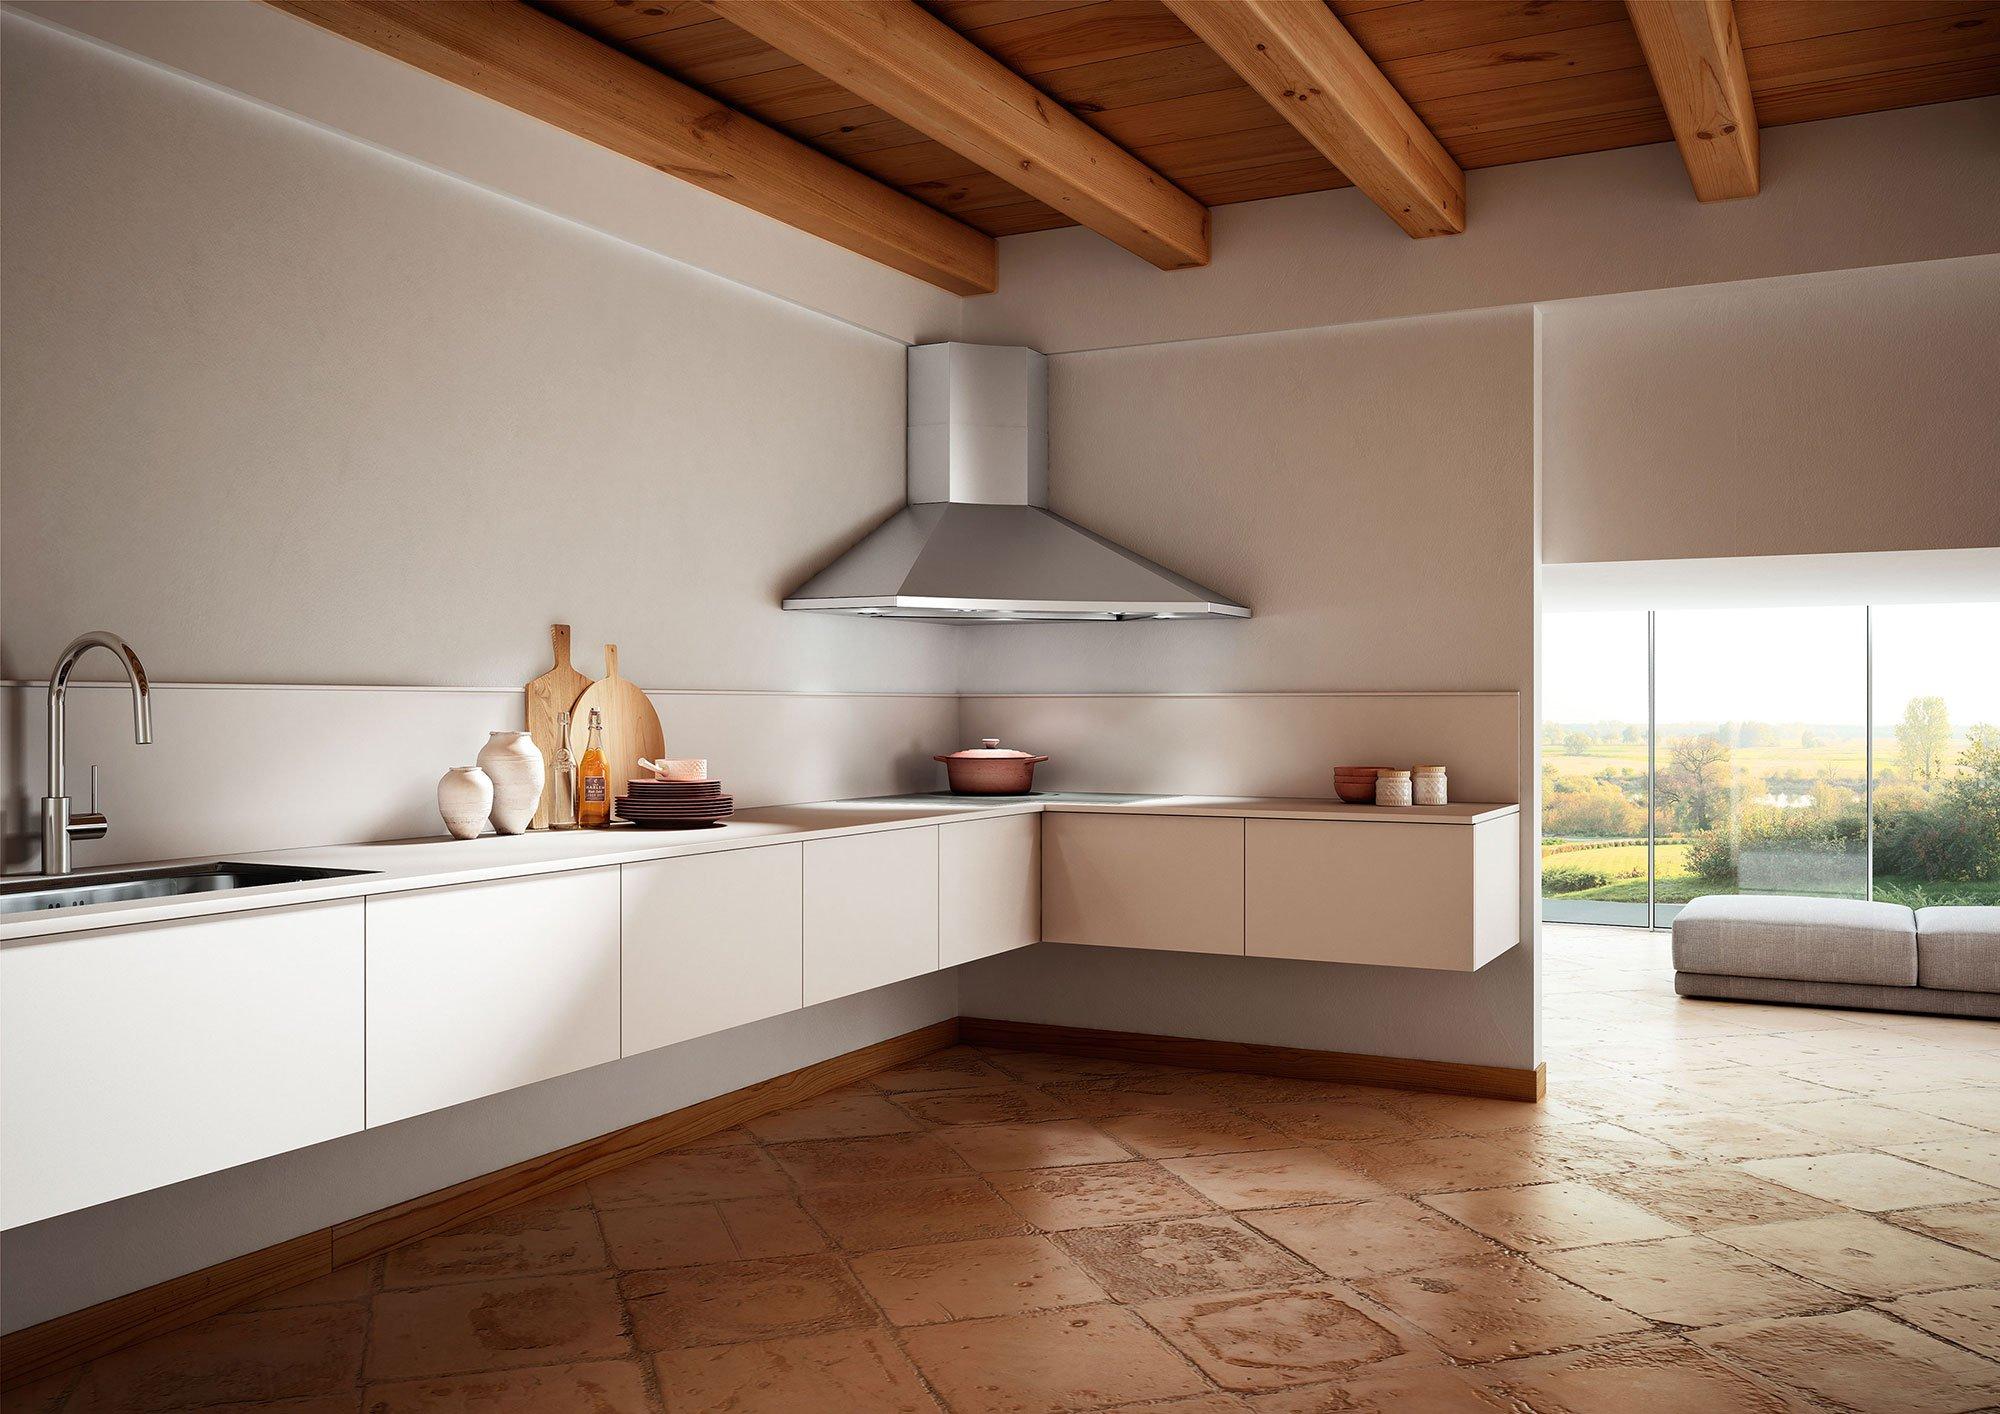 Ante Per Cucina Ikea. Fabulous Ante Per Cucina Ikea Luxury ...